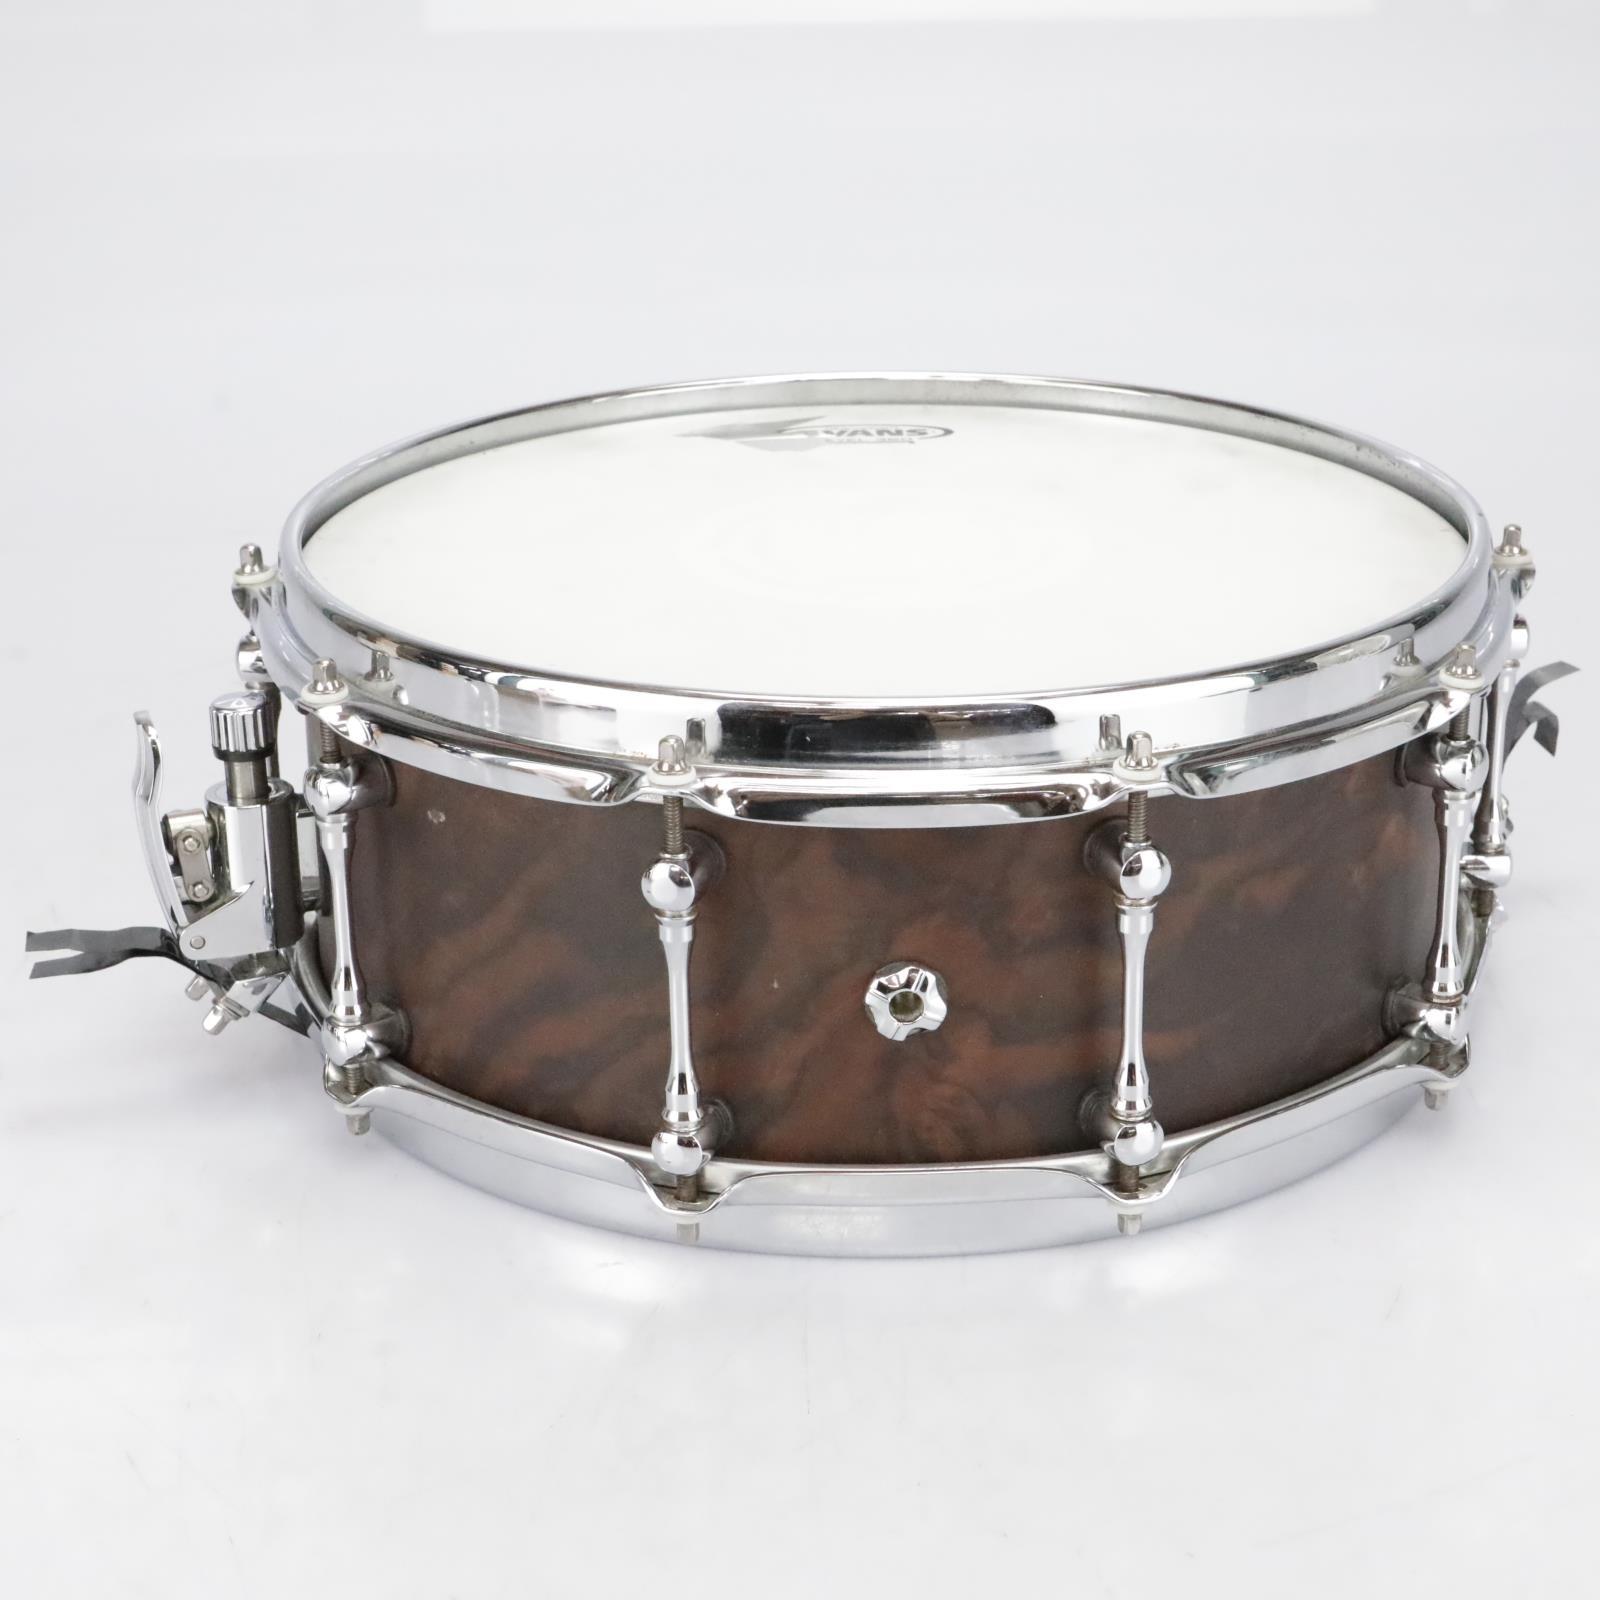 "Mapex Black Panther Walnut 14"" x 6"" Snare Drum #41061"